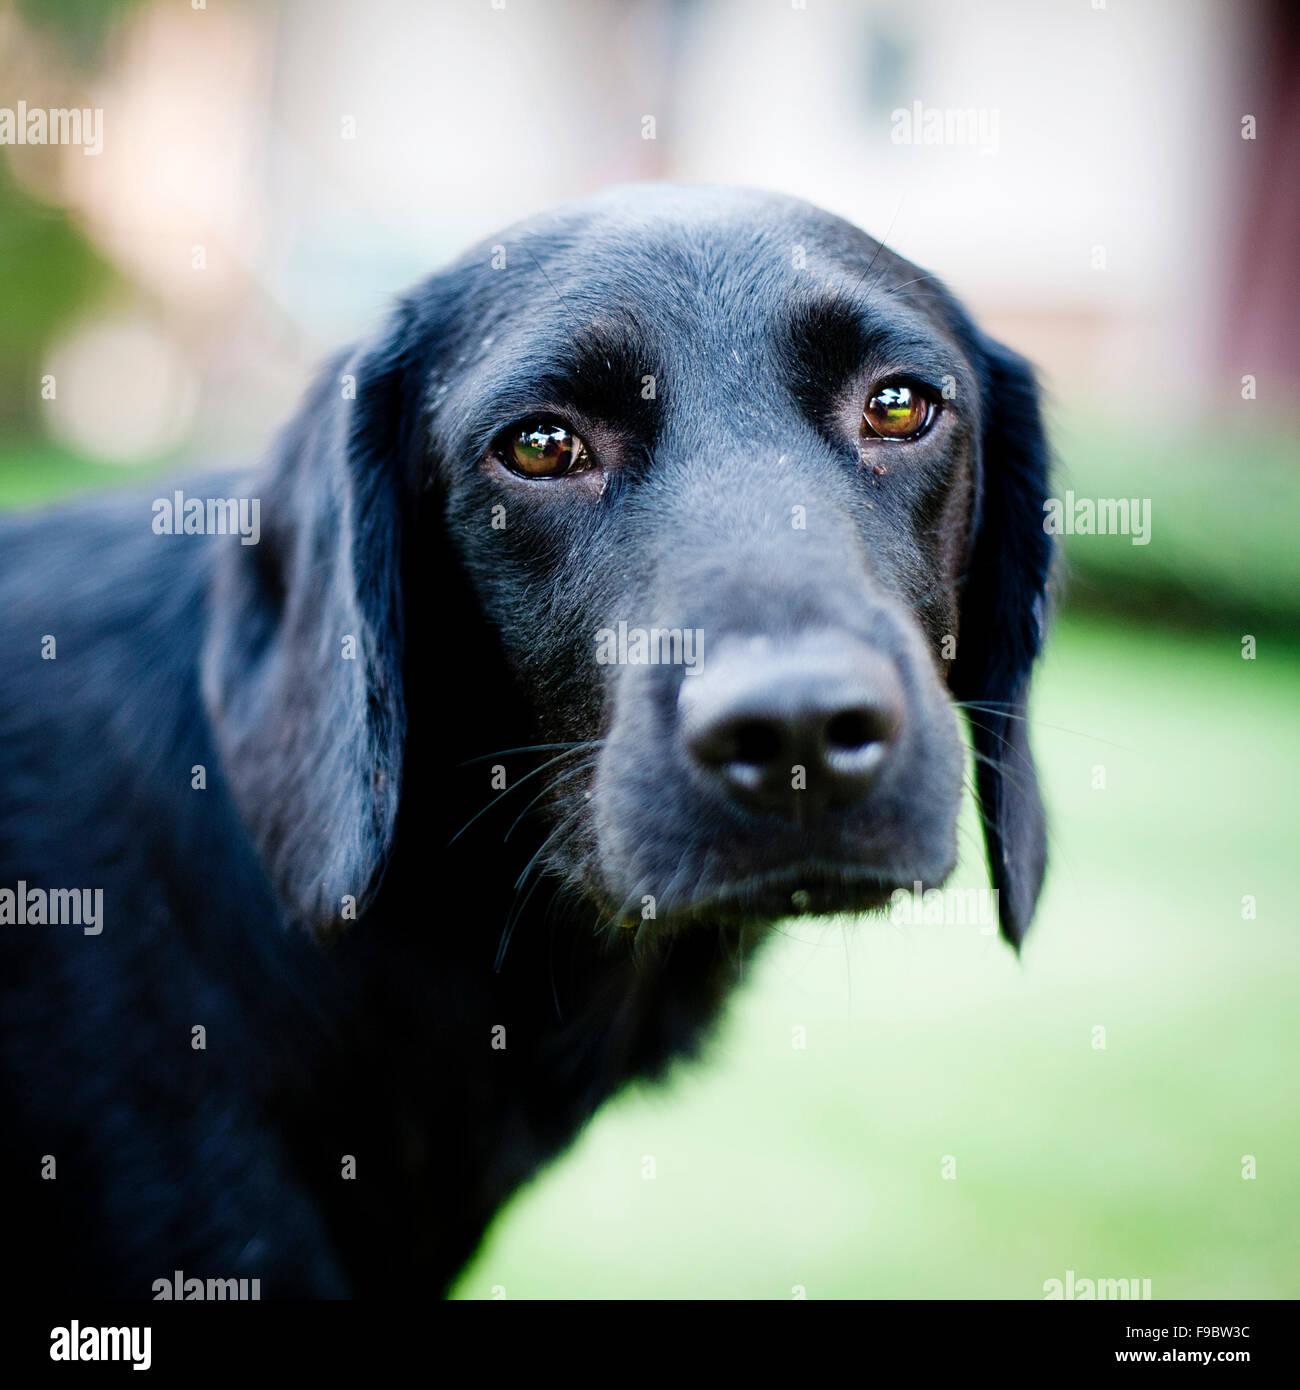 sad black dog is looking at the camera stock photo, royalty free